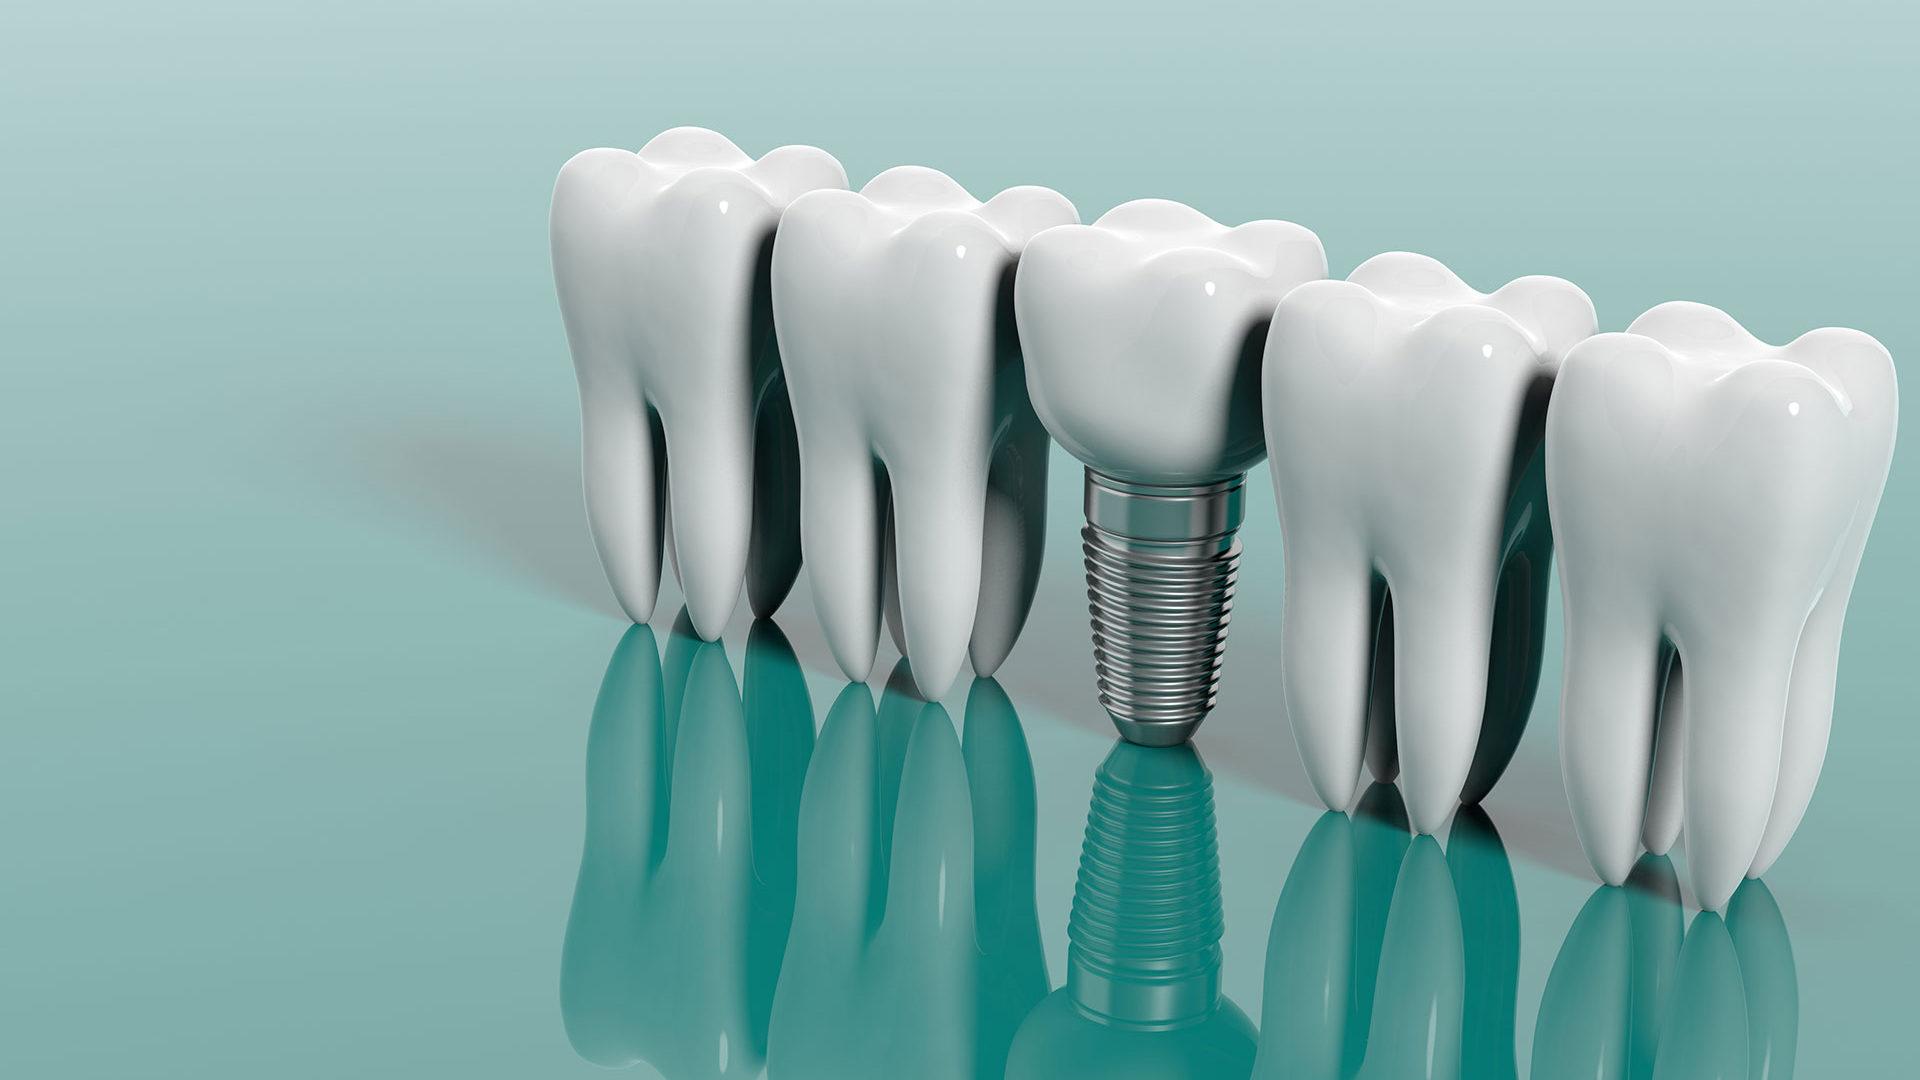 dental-implants-green-background-1920×1080